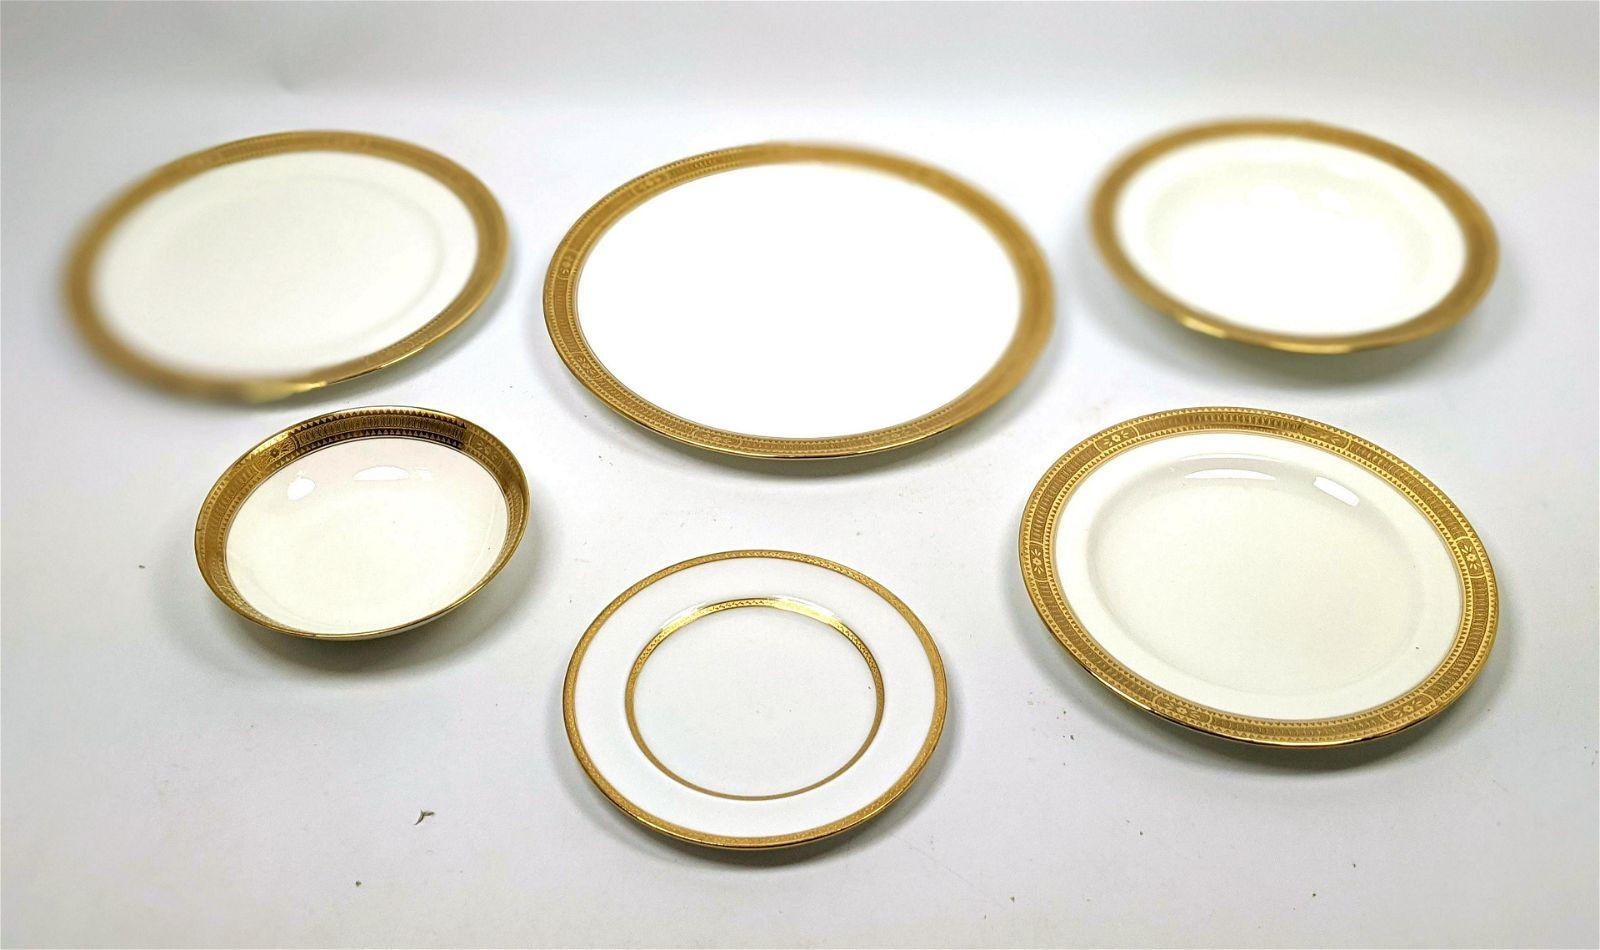 42pc China Dinnerware. 12pc Small plates ROYAL DOULTON.